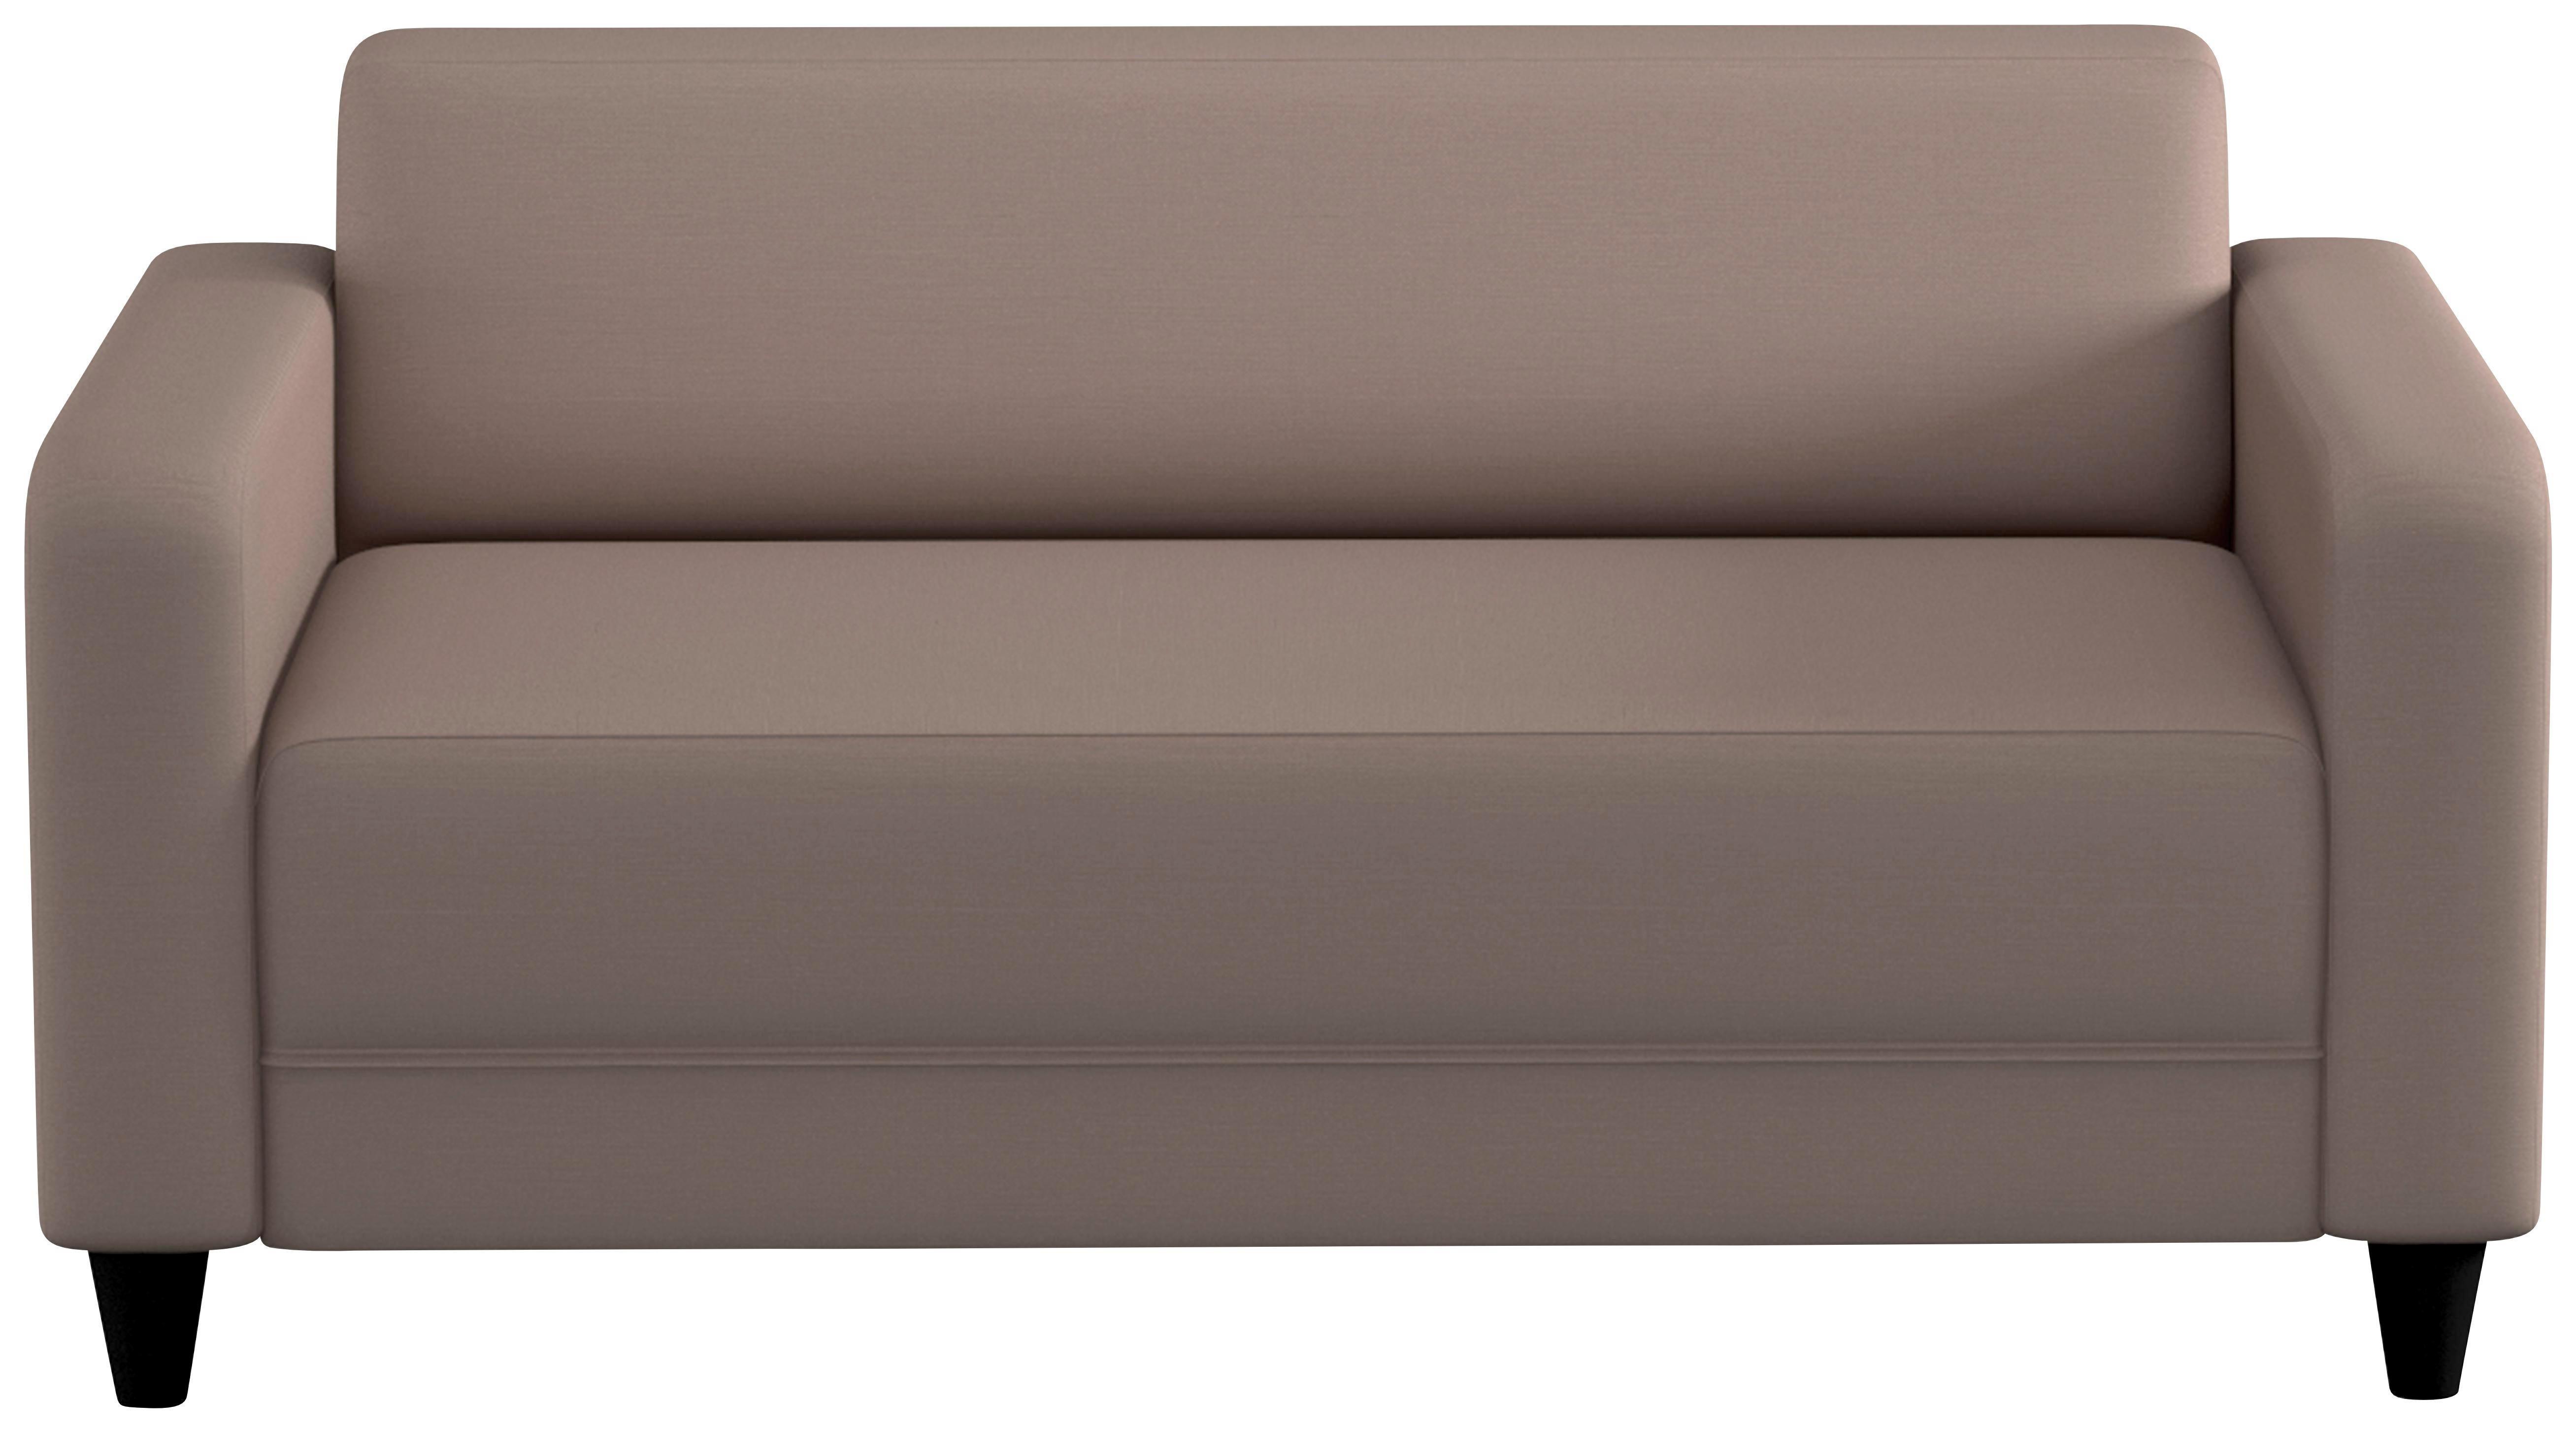 SOFA Taupe Taupe/Schwarz, KONVENTIONELL, Kunststoff/Textil (145/70